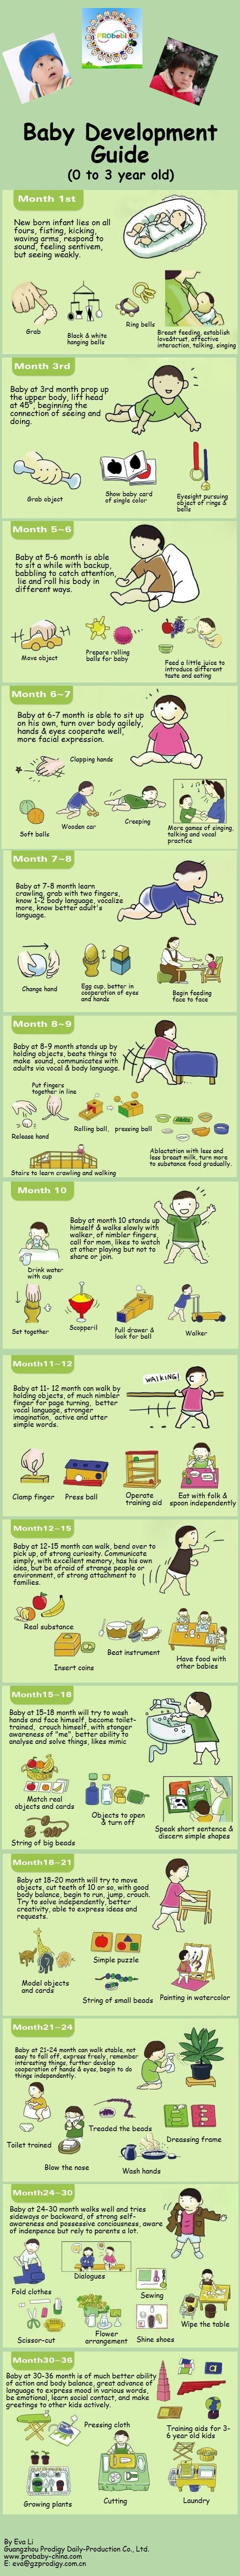 Baby Development Guide   @Piktochart #Infographic Editor